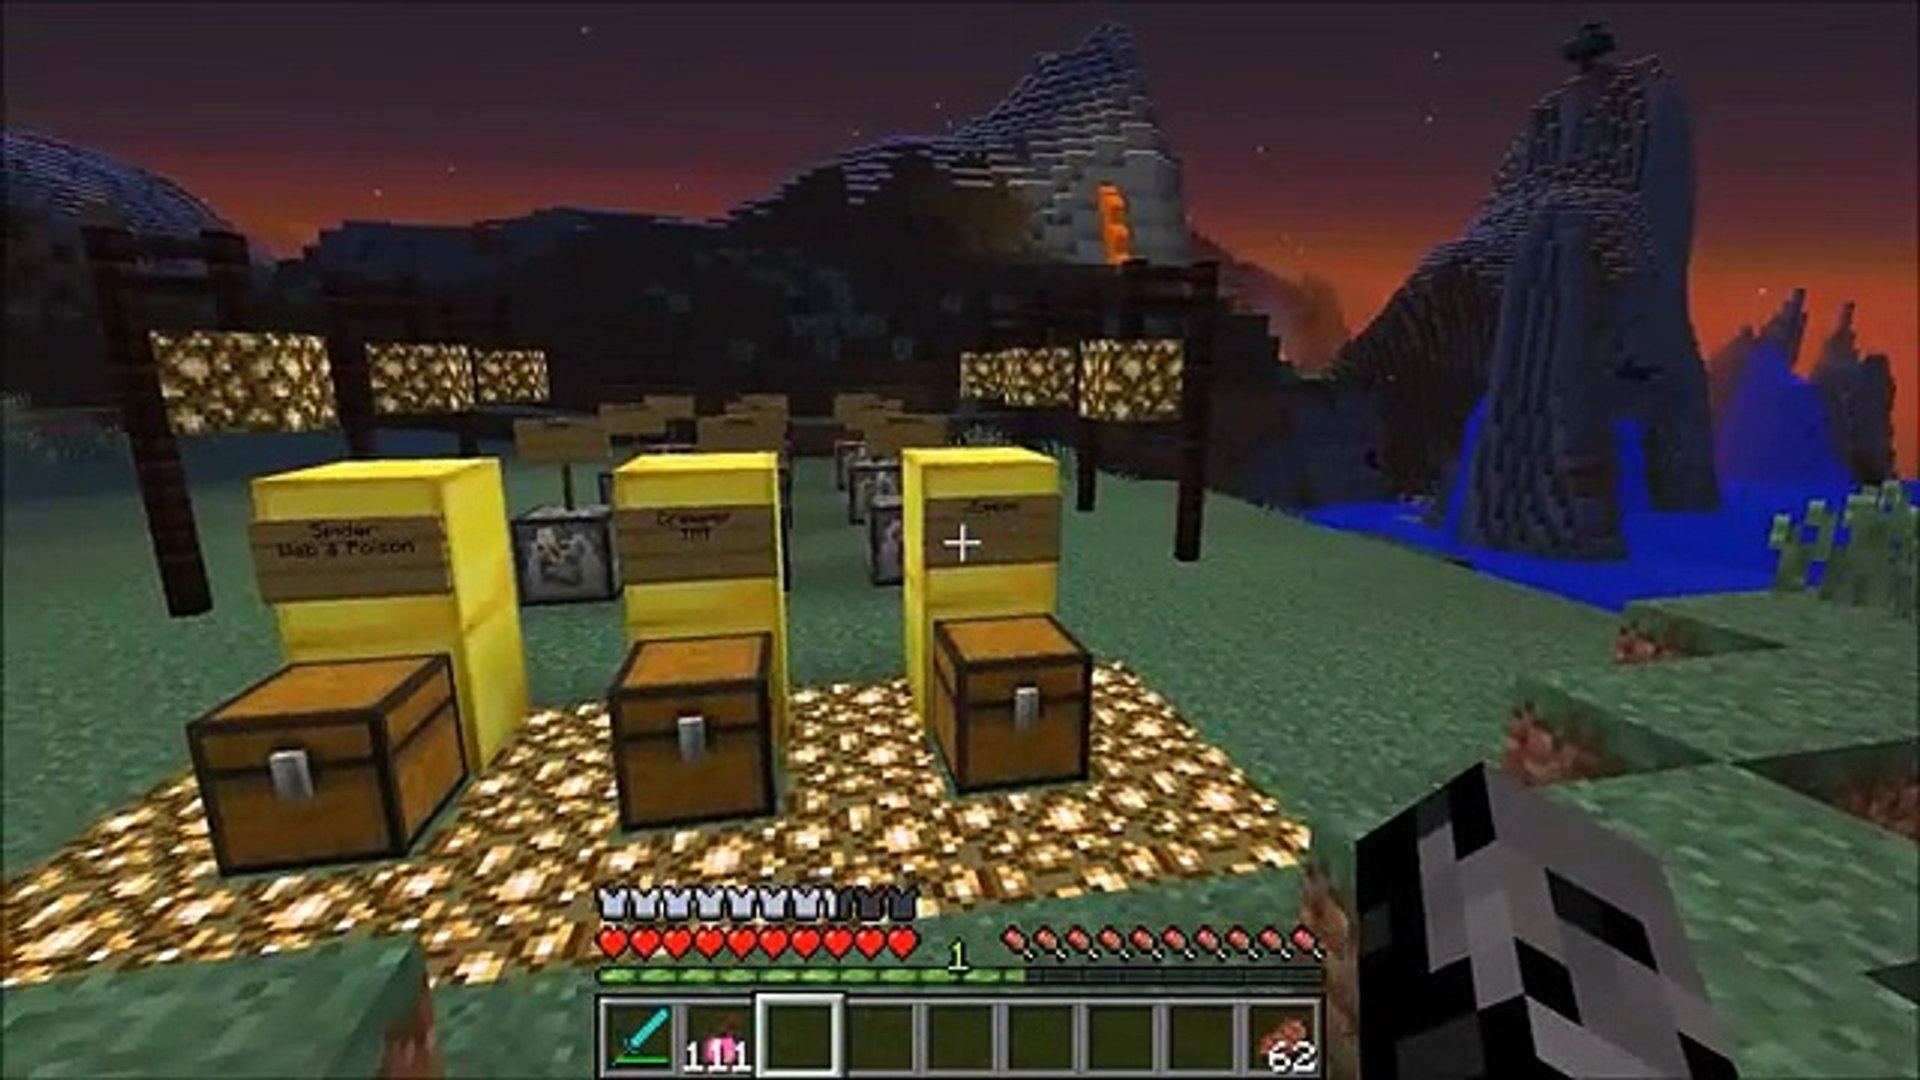 Minecraft_ PET MOBS MOD (PET CREEPERS, PET SPIDERS, & PET ZOMBIES!) Mod Showcase